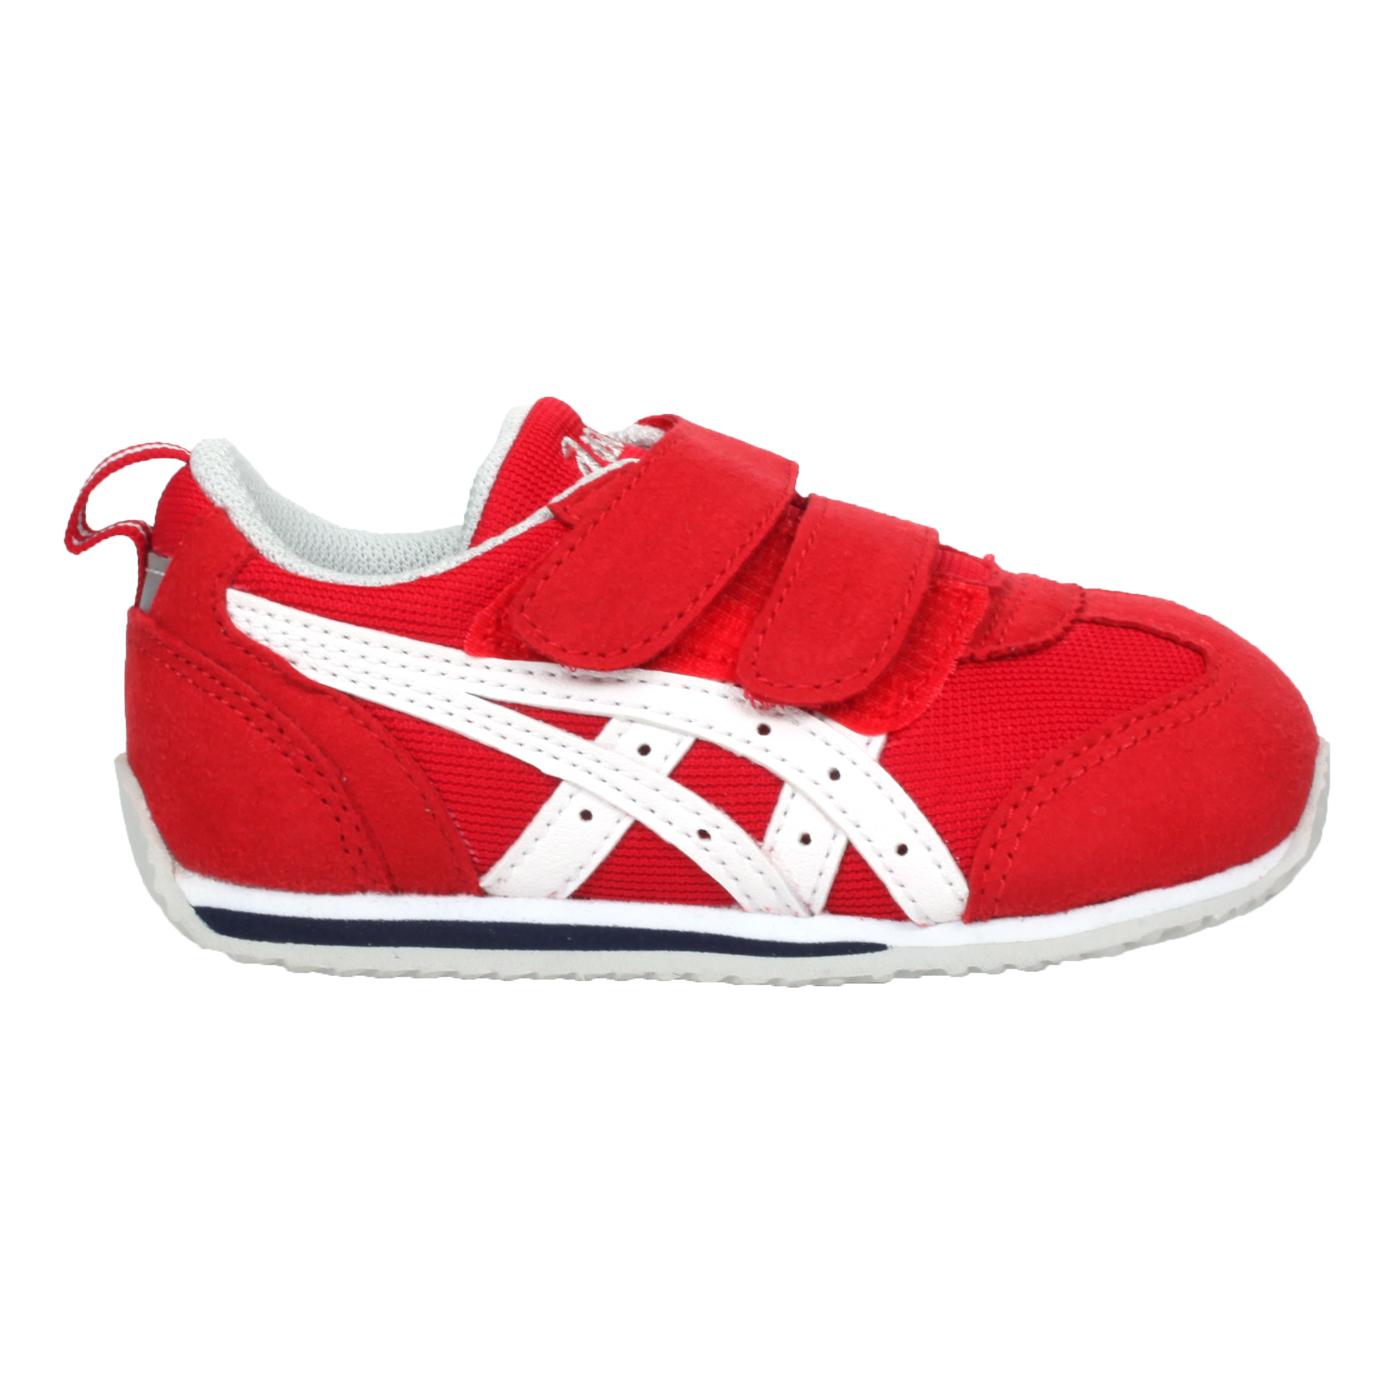 ASICS 小童運動鞋  @IDAHO BABY JP@TUB164-600